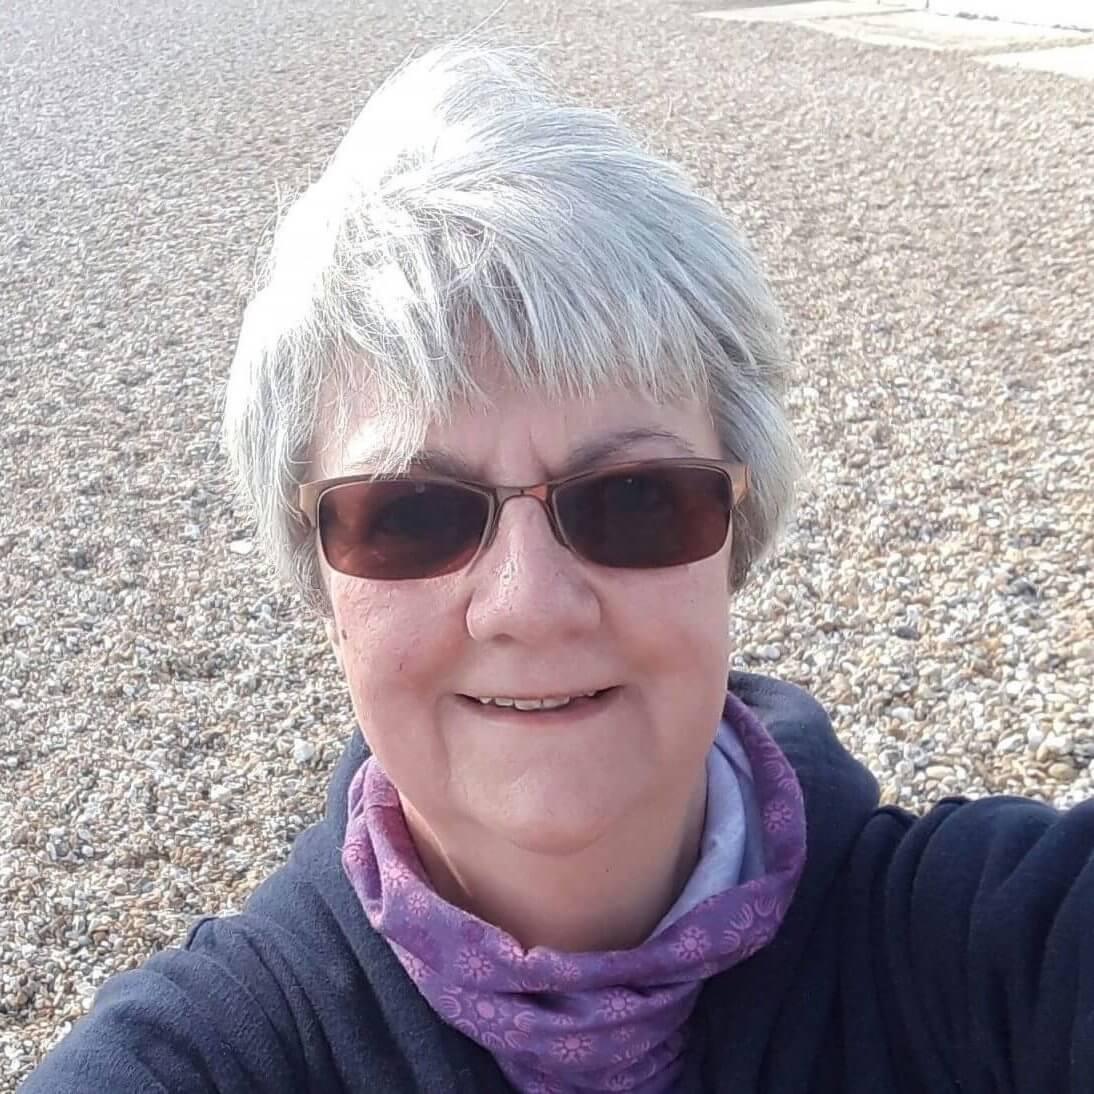 Susan-on-Promenade-at-Bognor-Regis-cropped-1-e1579094745239.jpg